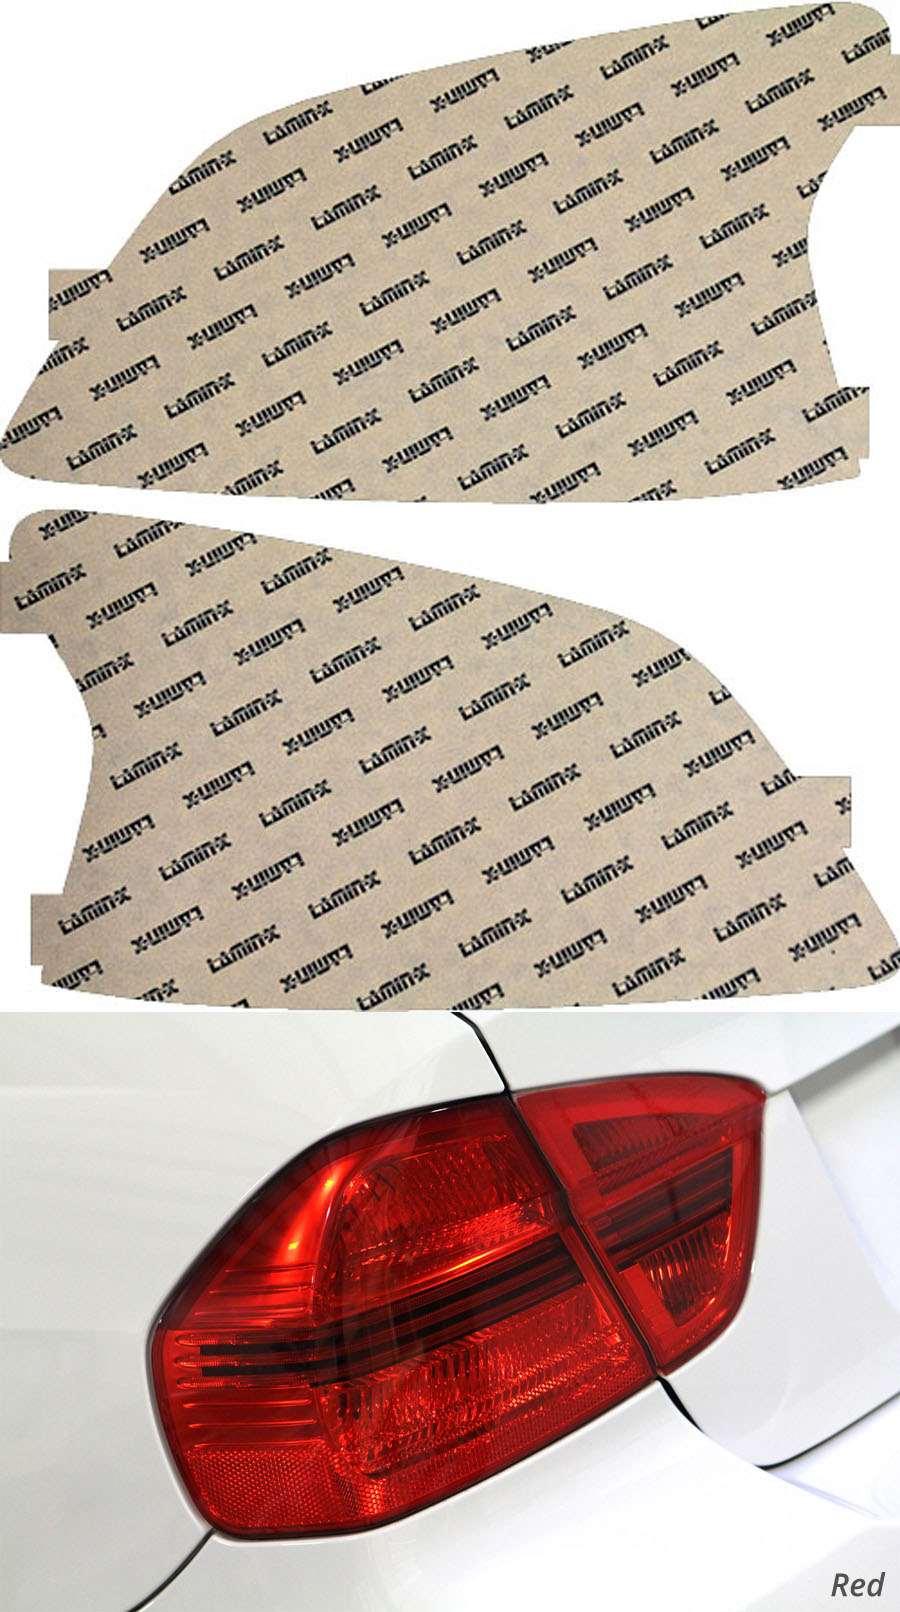 Toyota Yaris Sedan 07-11 Red Tail Light Covers Lamin-X T219R